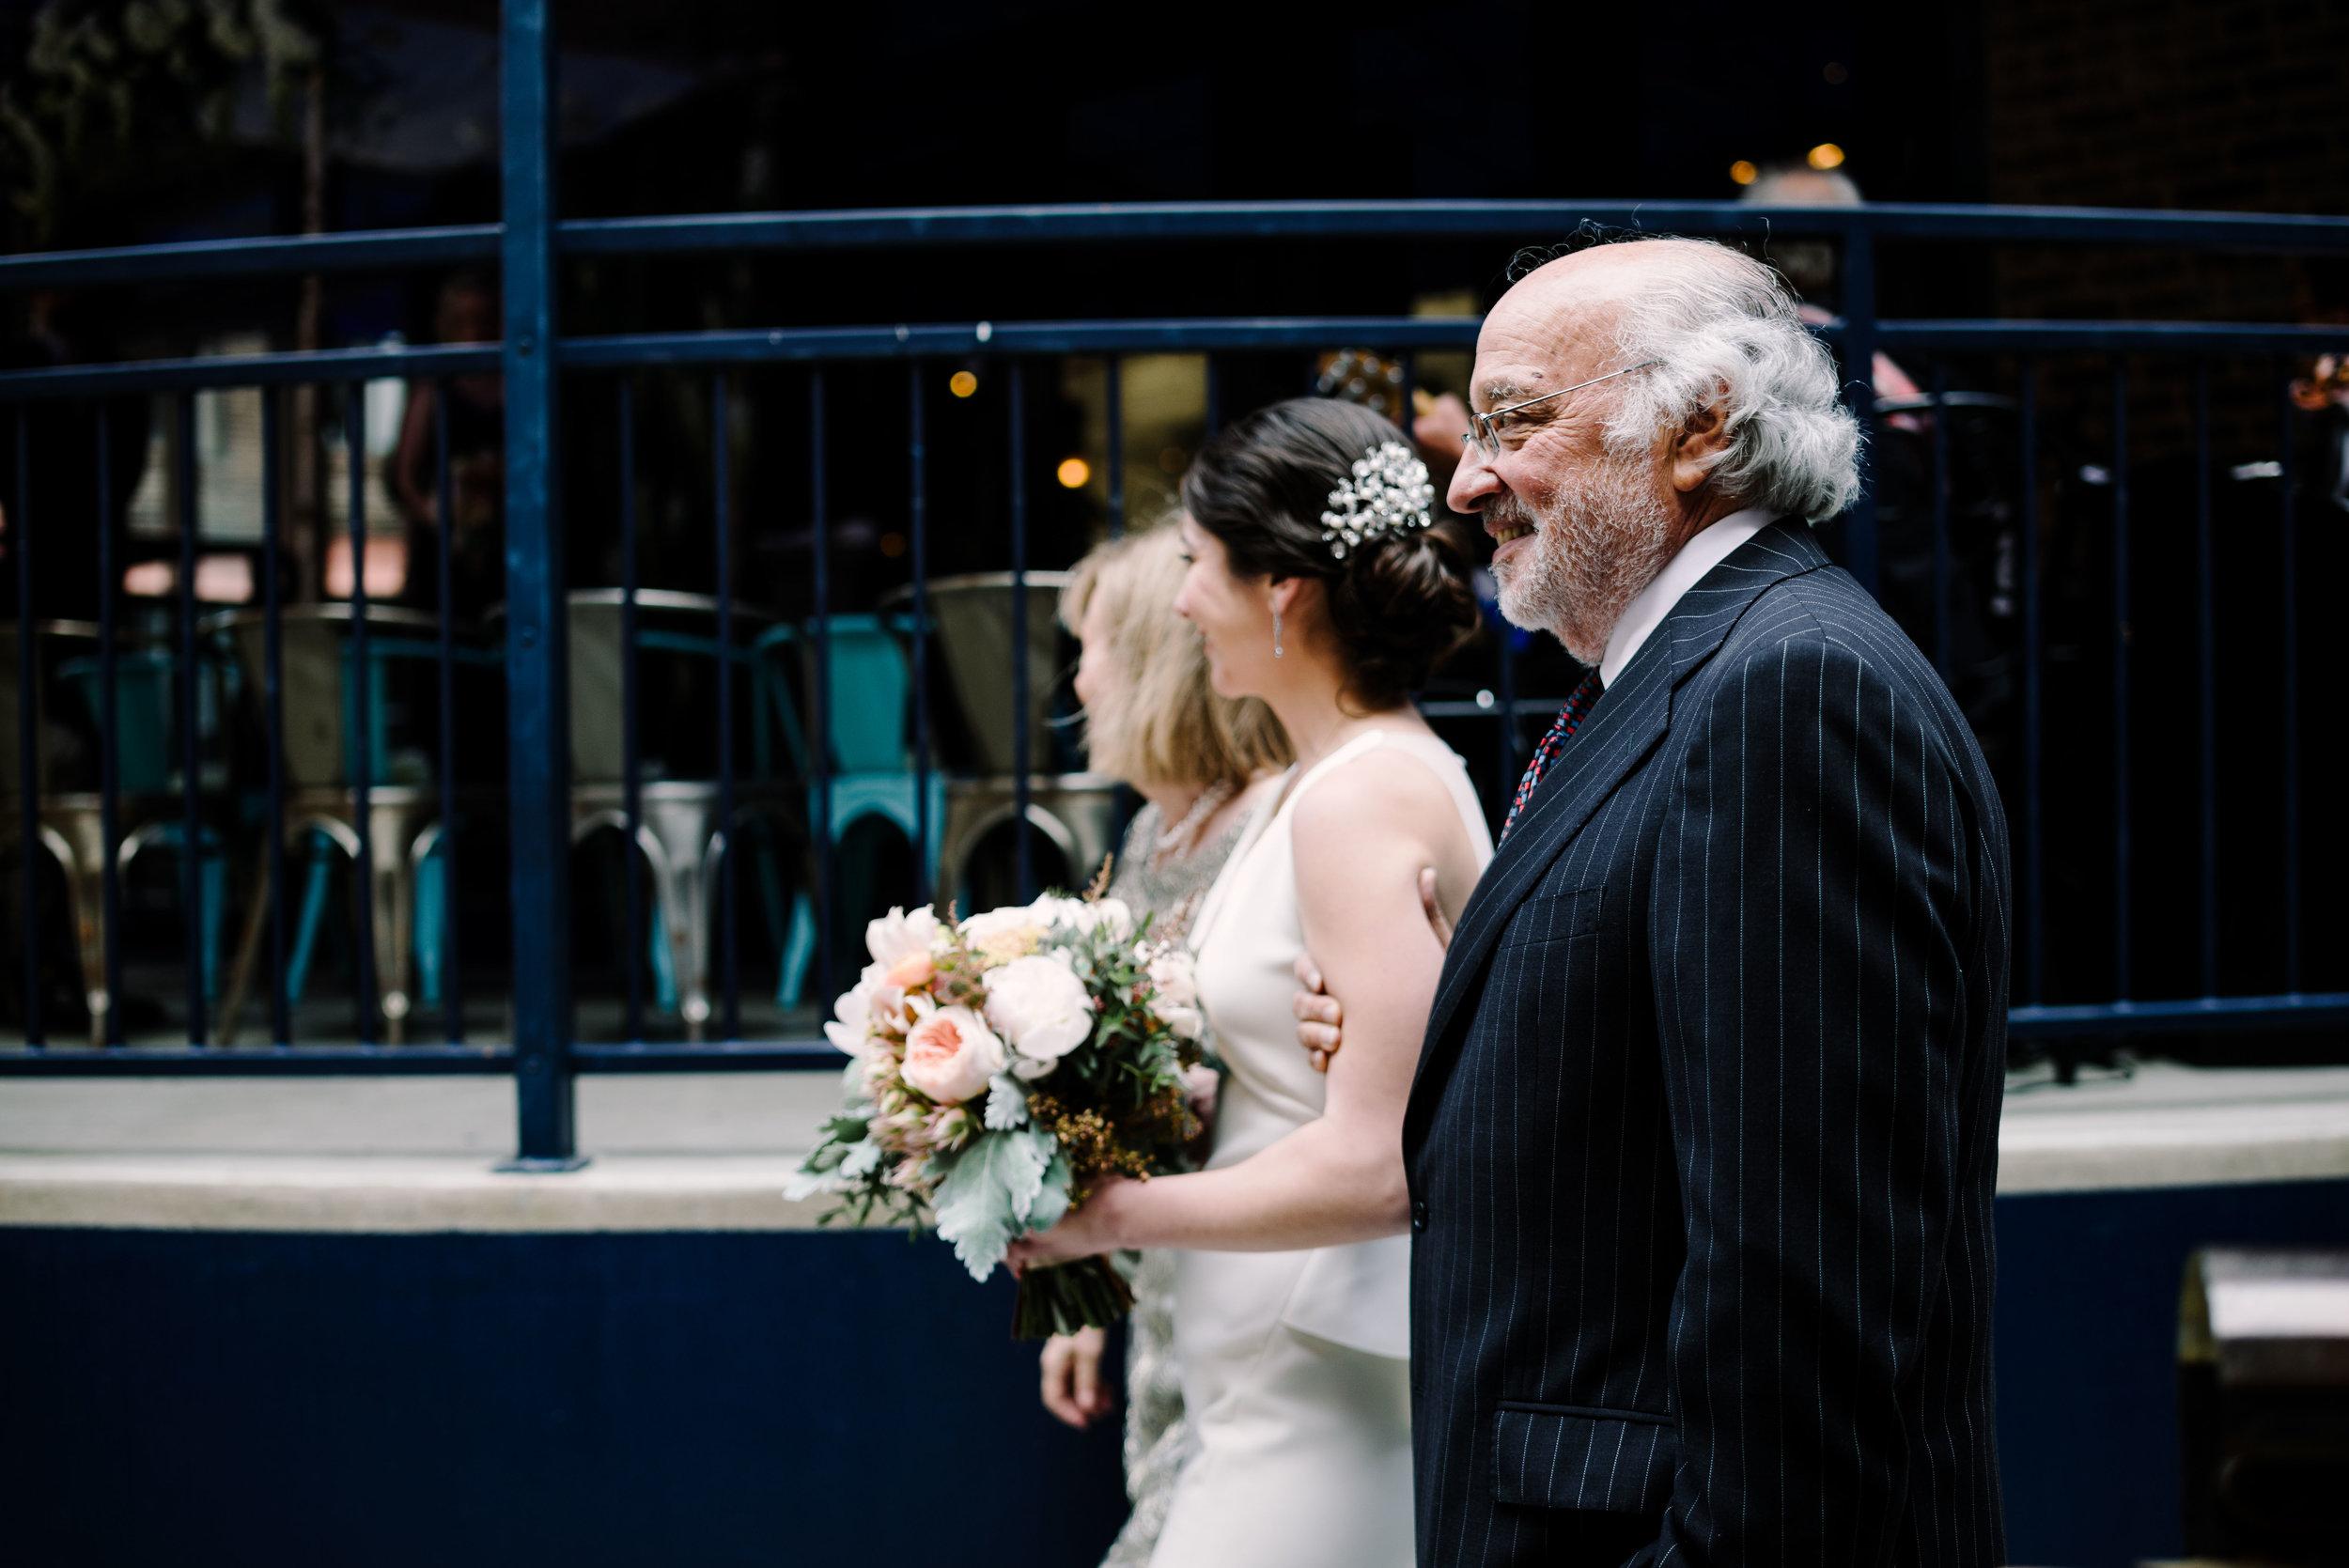 Patricia-Steve-Blog-Indianapolis-Wedding-59.jpg